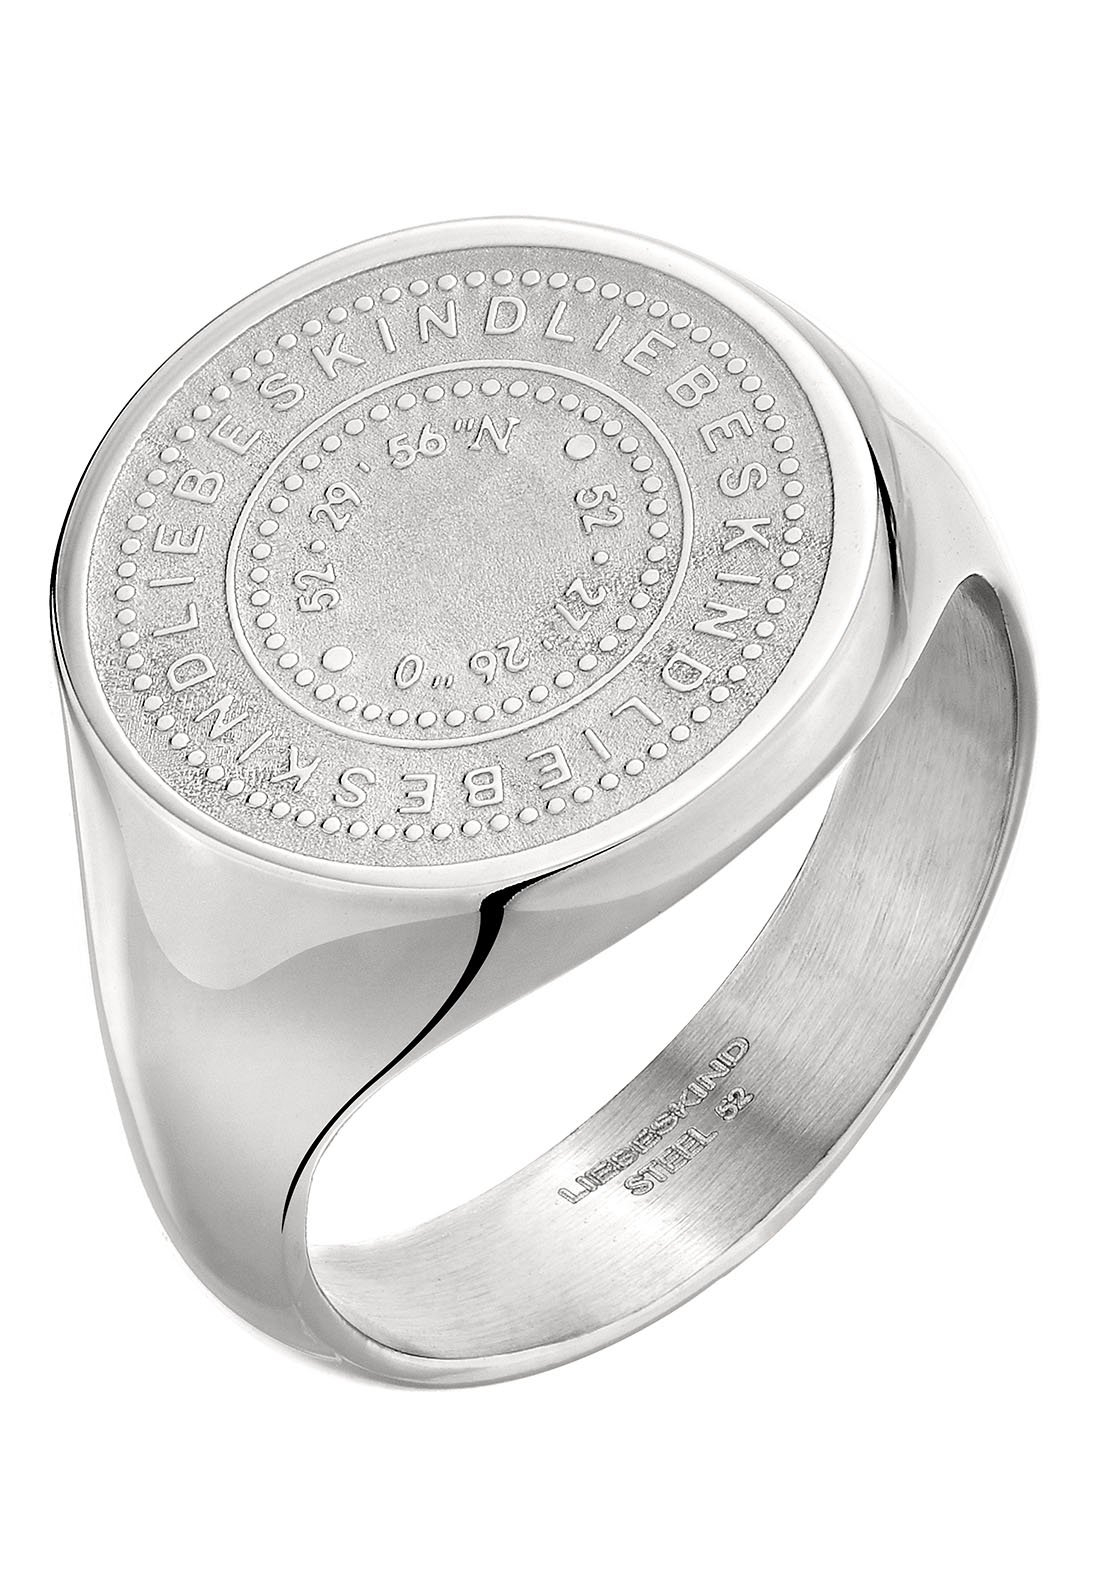 Liebeskind Berlin ring , LJ-0713-R-52,54,56, LJ-0714-R-52,54,56 goedkoop op otto.nl kopen